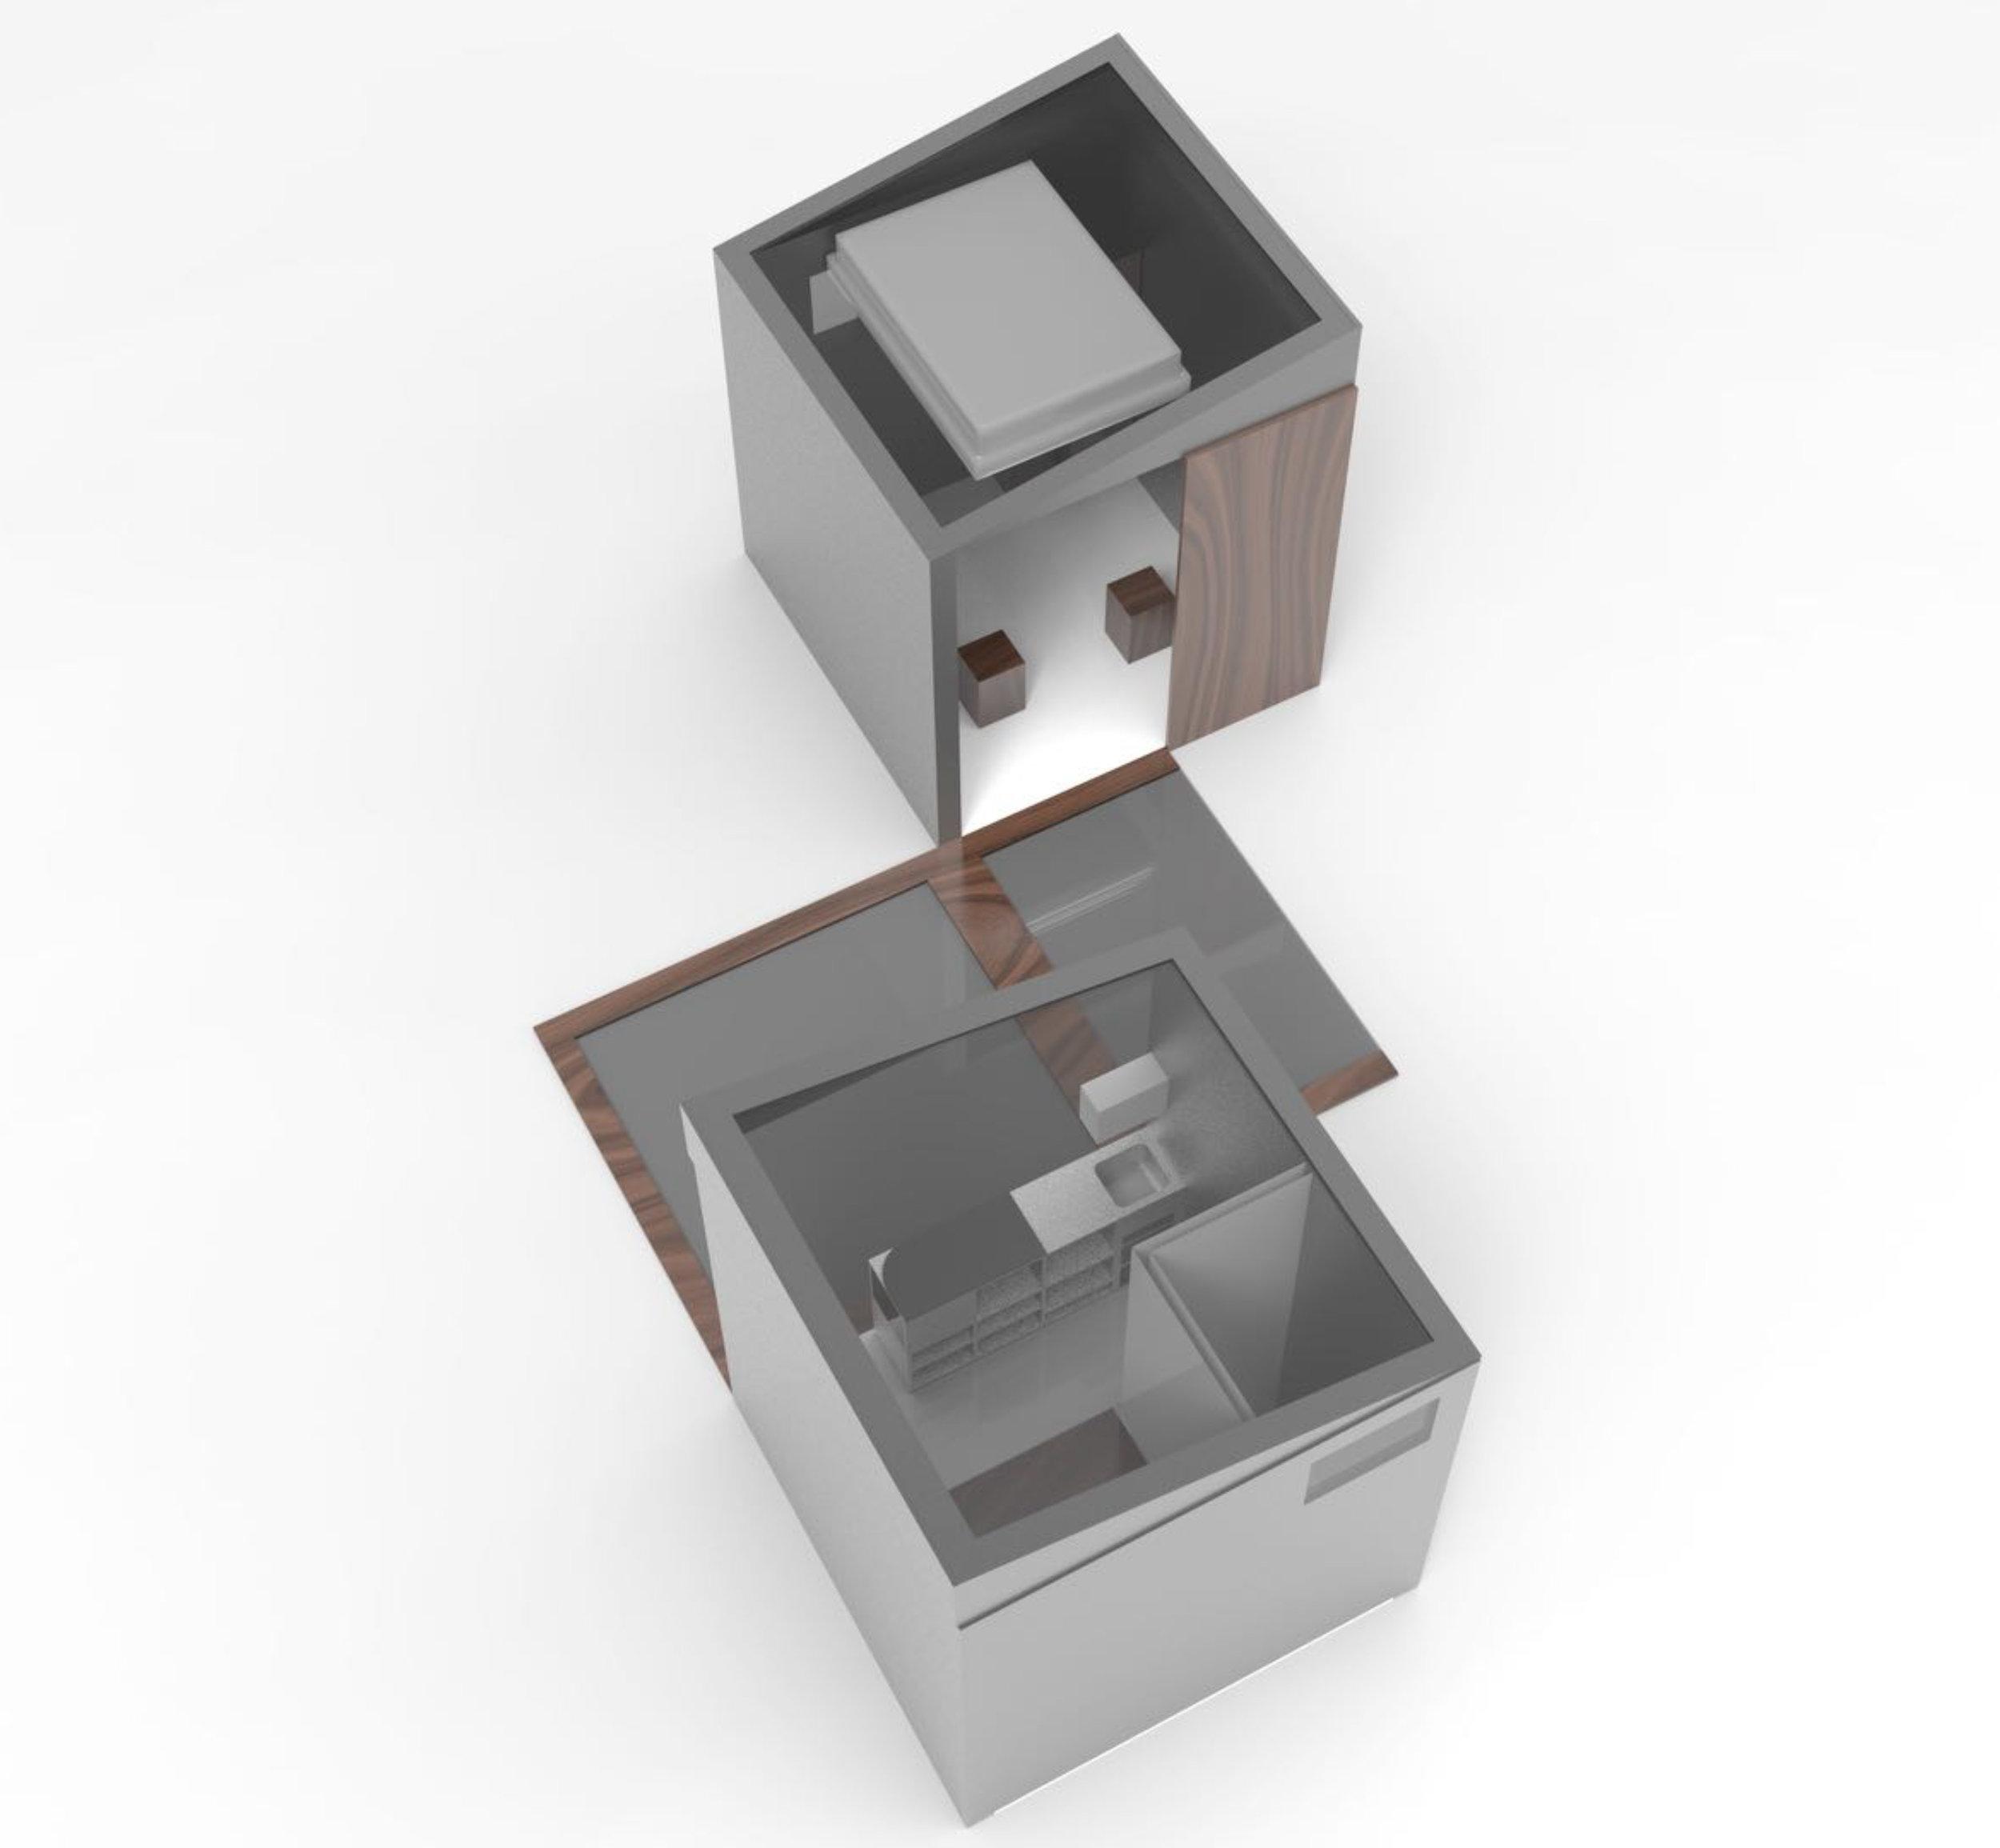 Final rendering of   Cubix                                                 Credit: Shikhar Tyagi